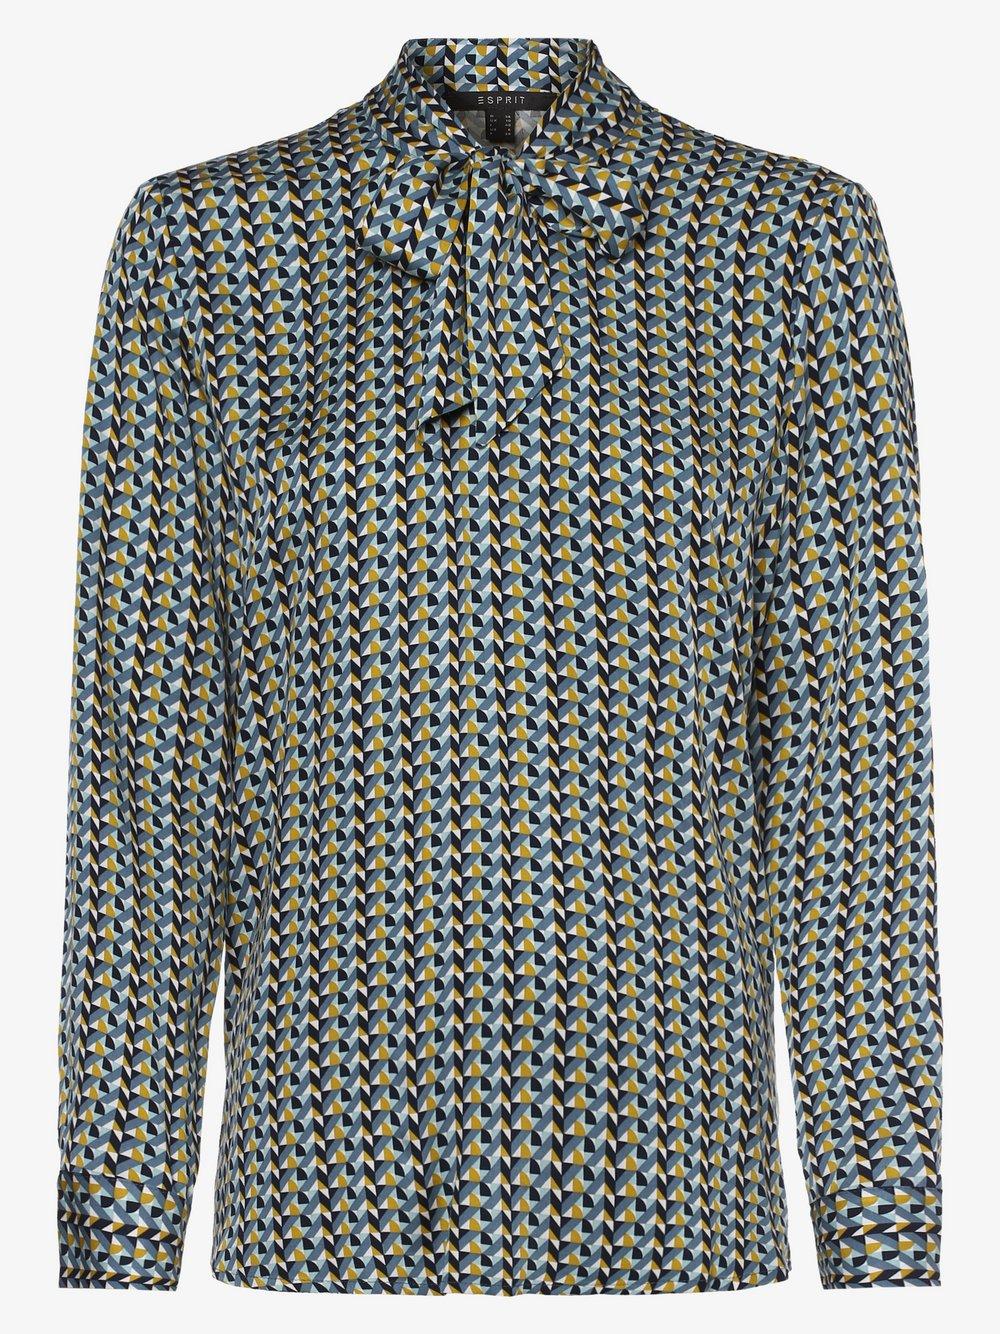 Esprit Collection – Bluzka damska, zielony Van Graaf 452036-0001-00360